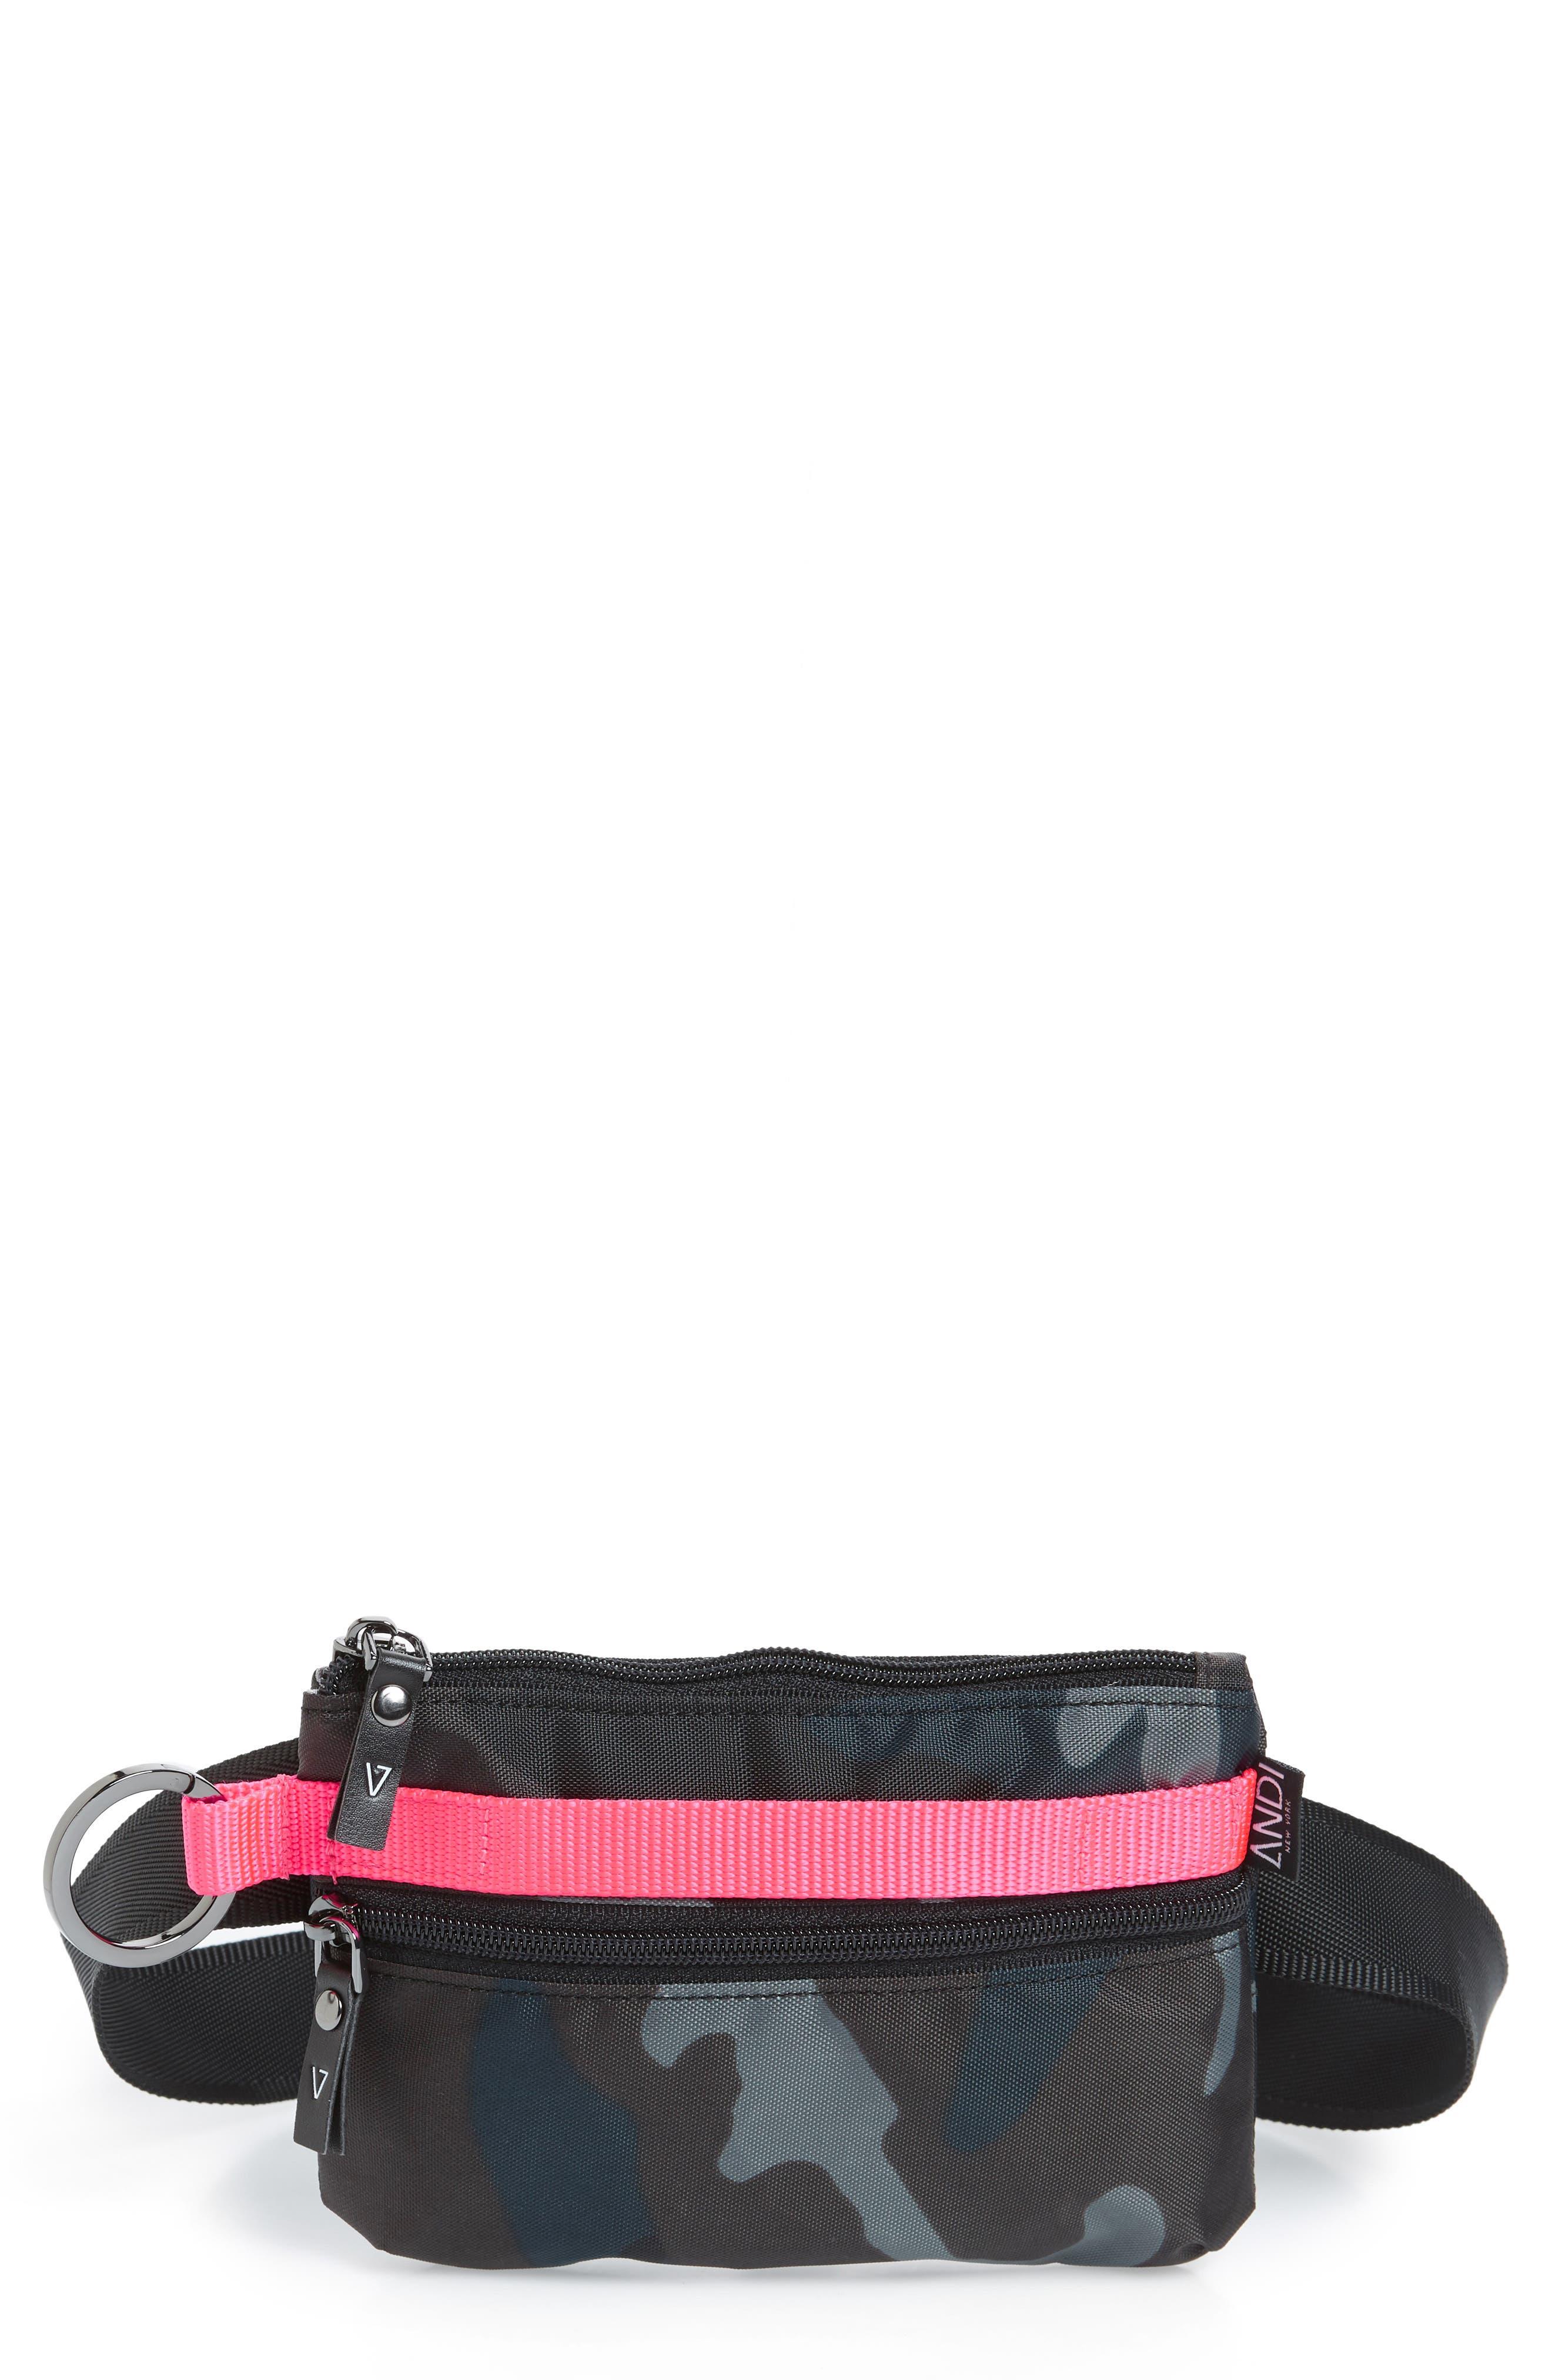 ANDI Urban Clutch Convertible Belt Bag - Blue in Navy Camo/ Hot Pink